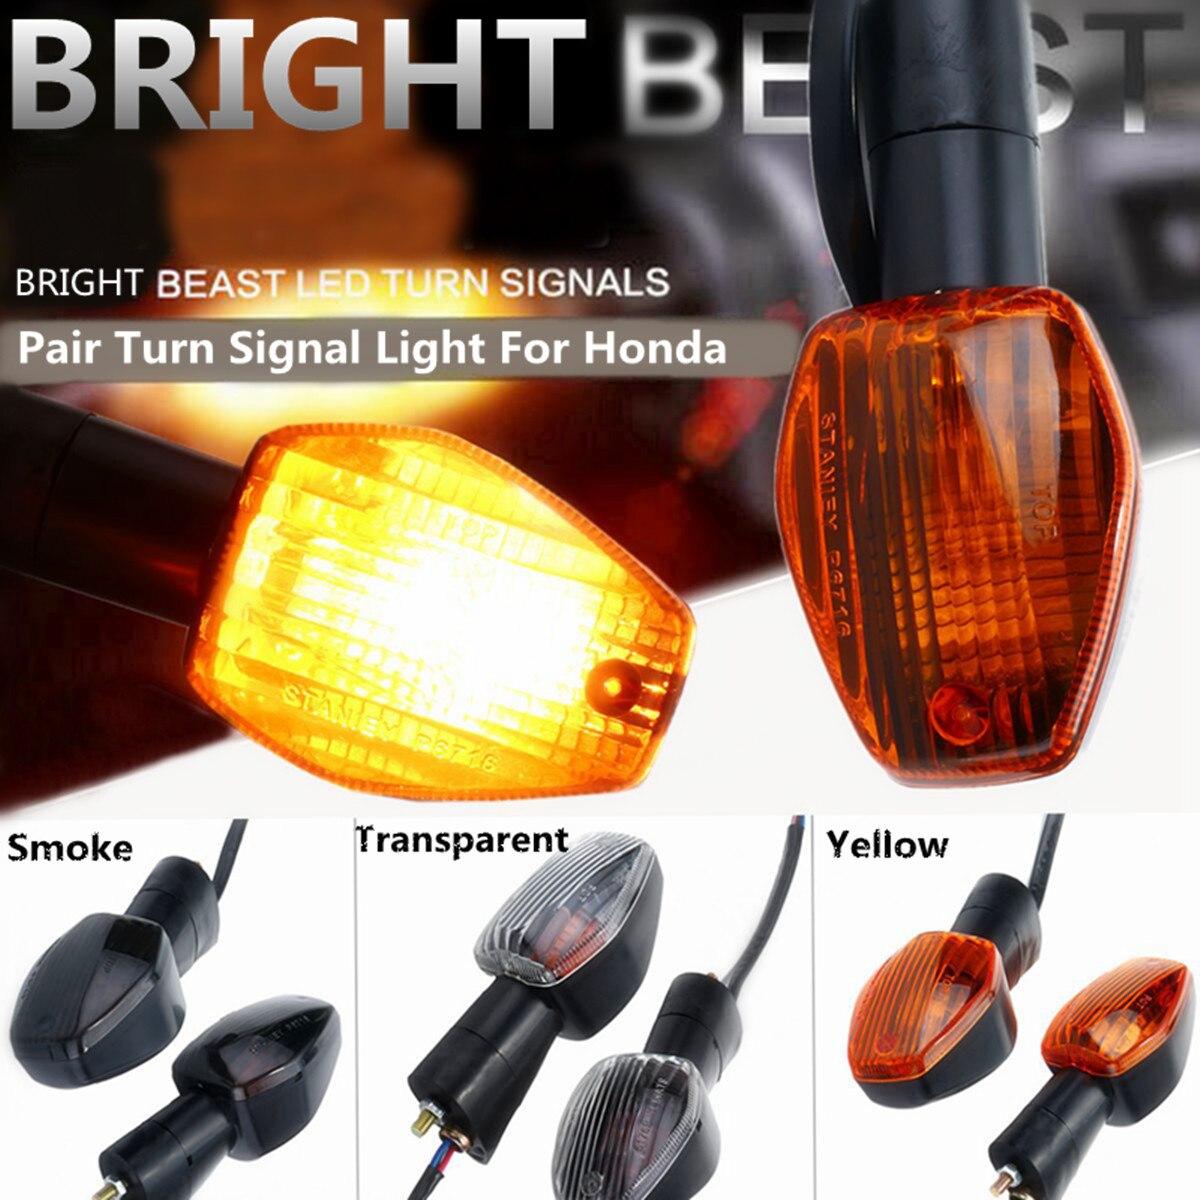 US 4x Motorcycle Mini Turn Signal Indicators Bulb Light for Honda CBR954RR 2002